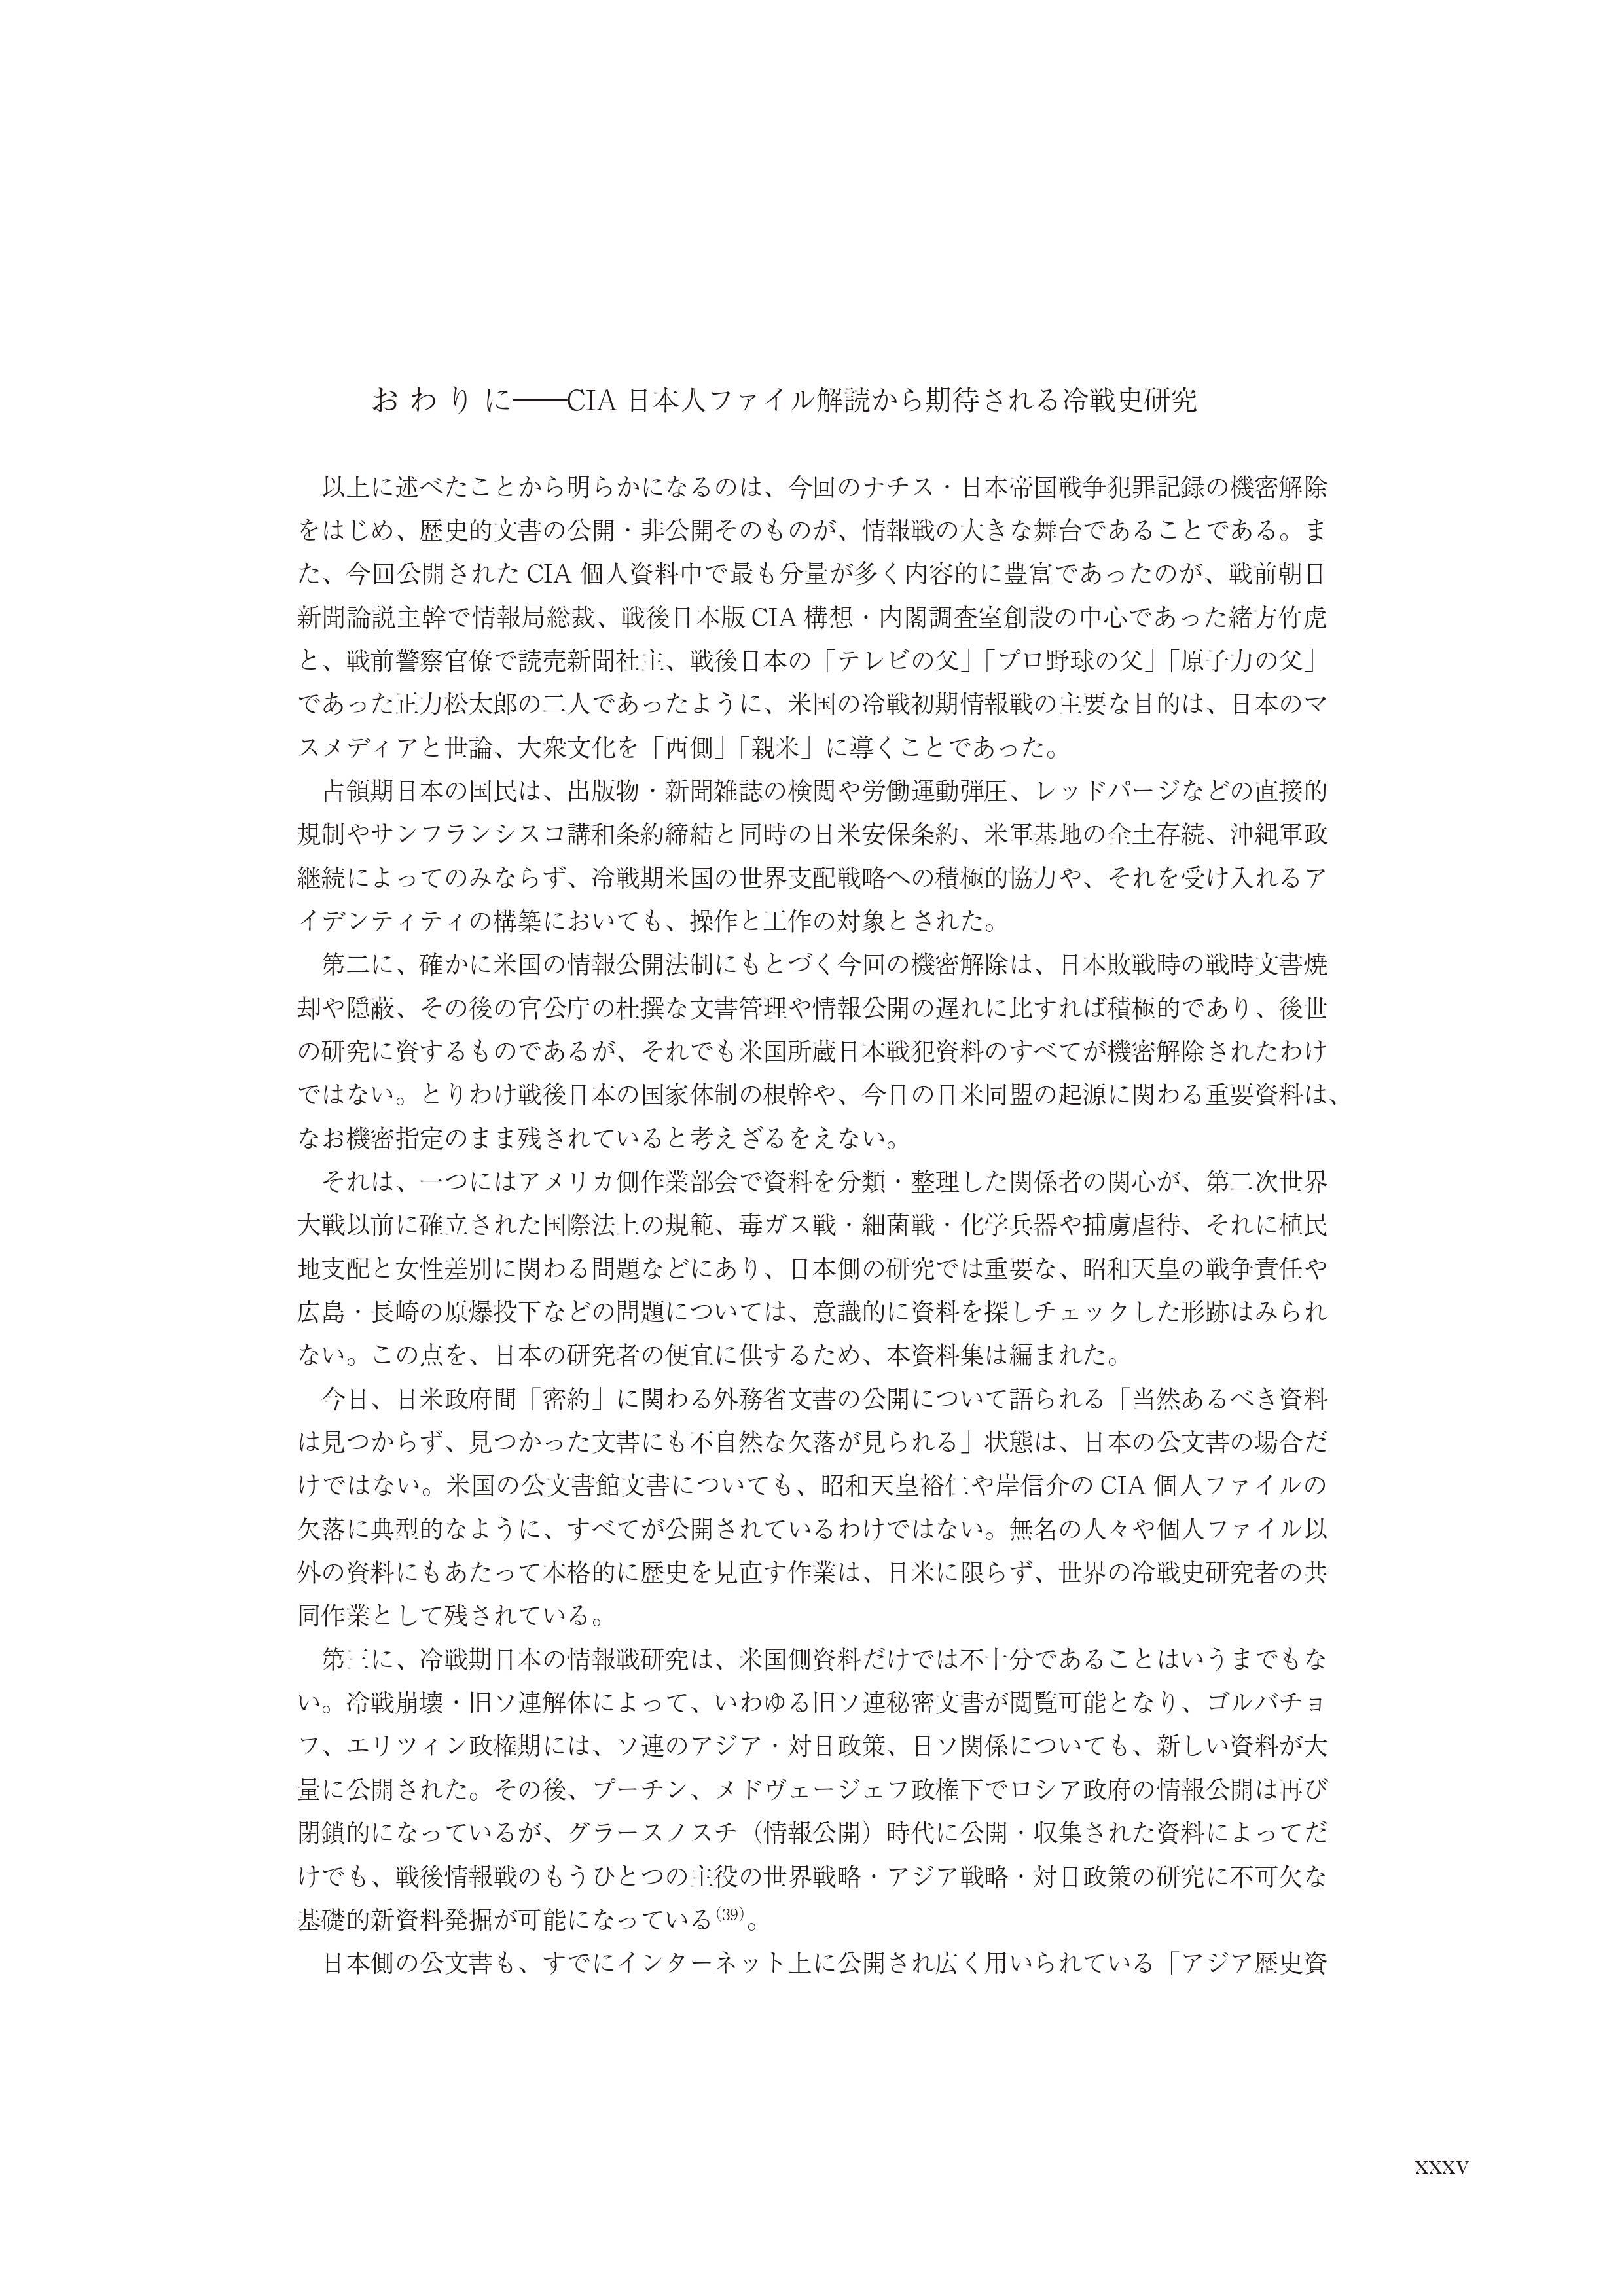 CIA日本人ファイル0001 (35)